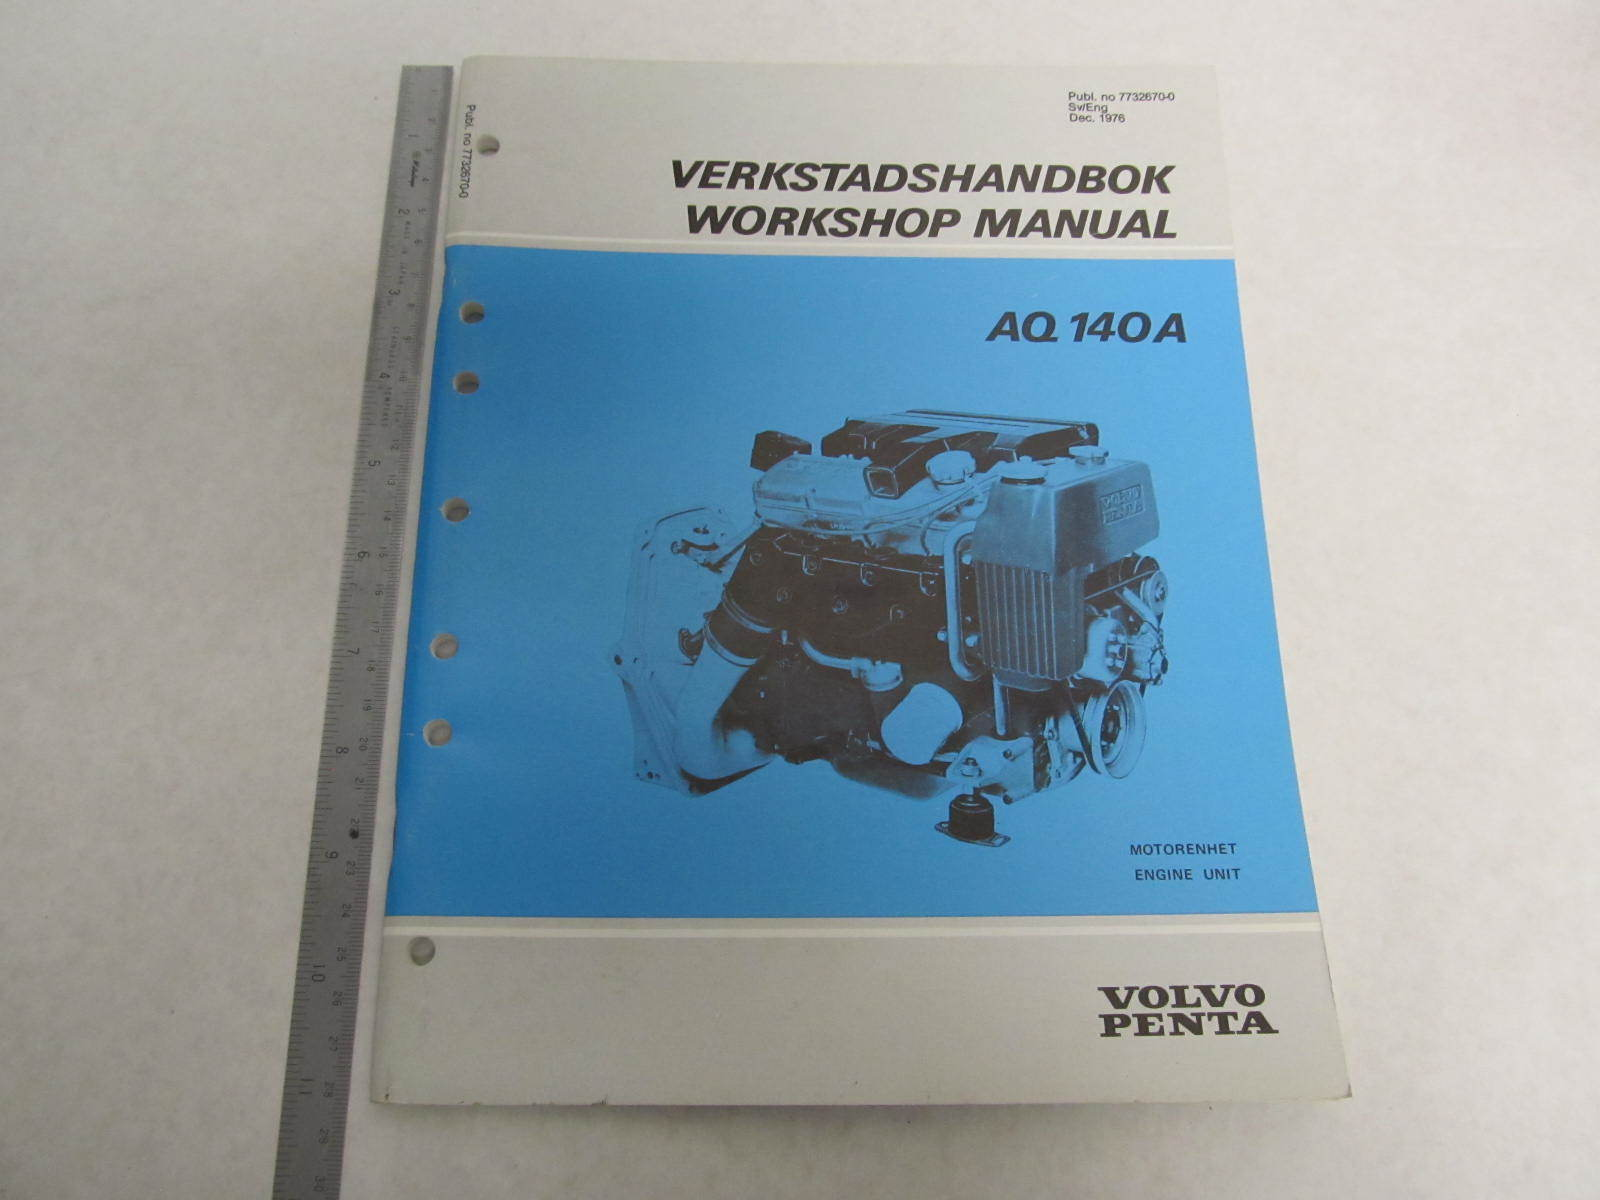 7732670 0 volvo penta aquamatic service workshop manual aq Volvo Penta Outdrive Volvo Penta Shop Manual